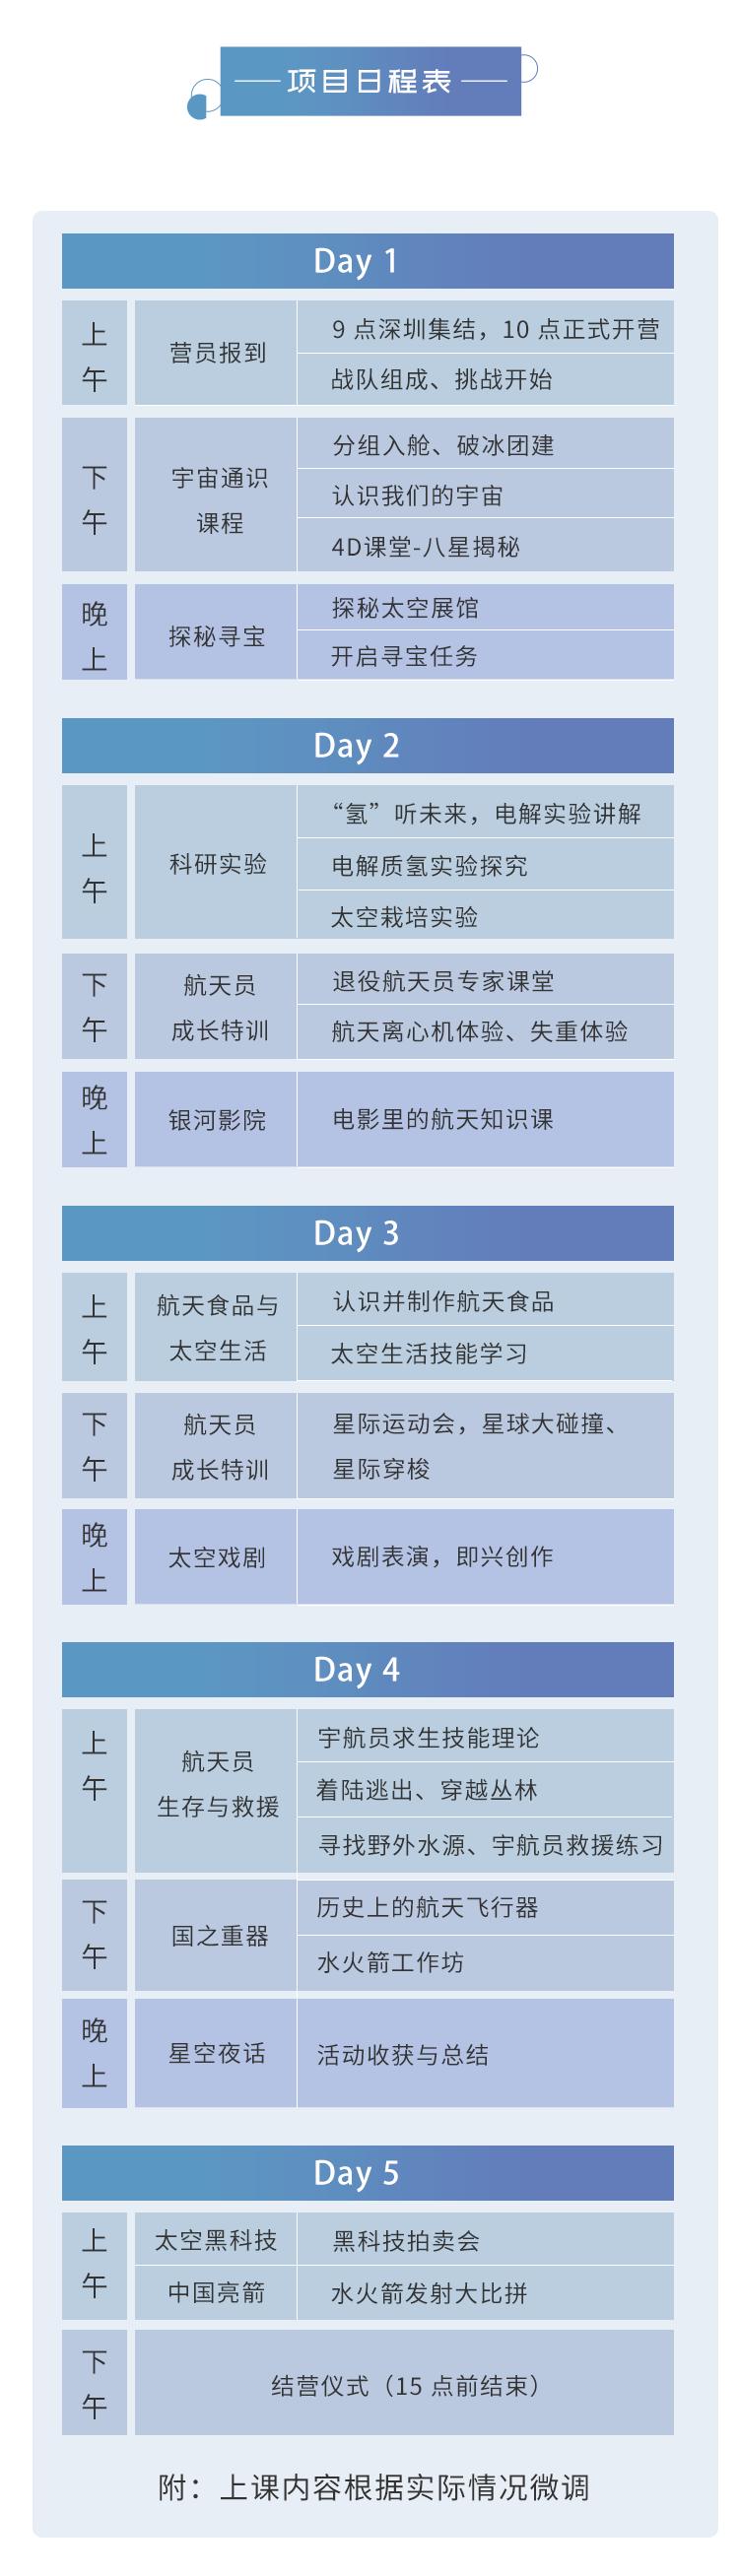 深圳冬令营-内页-3_01.png